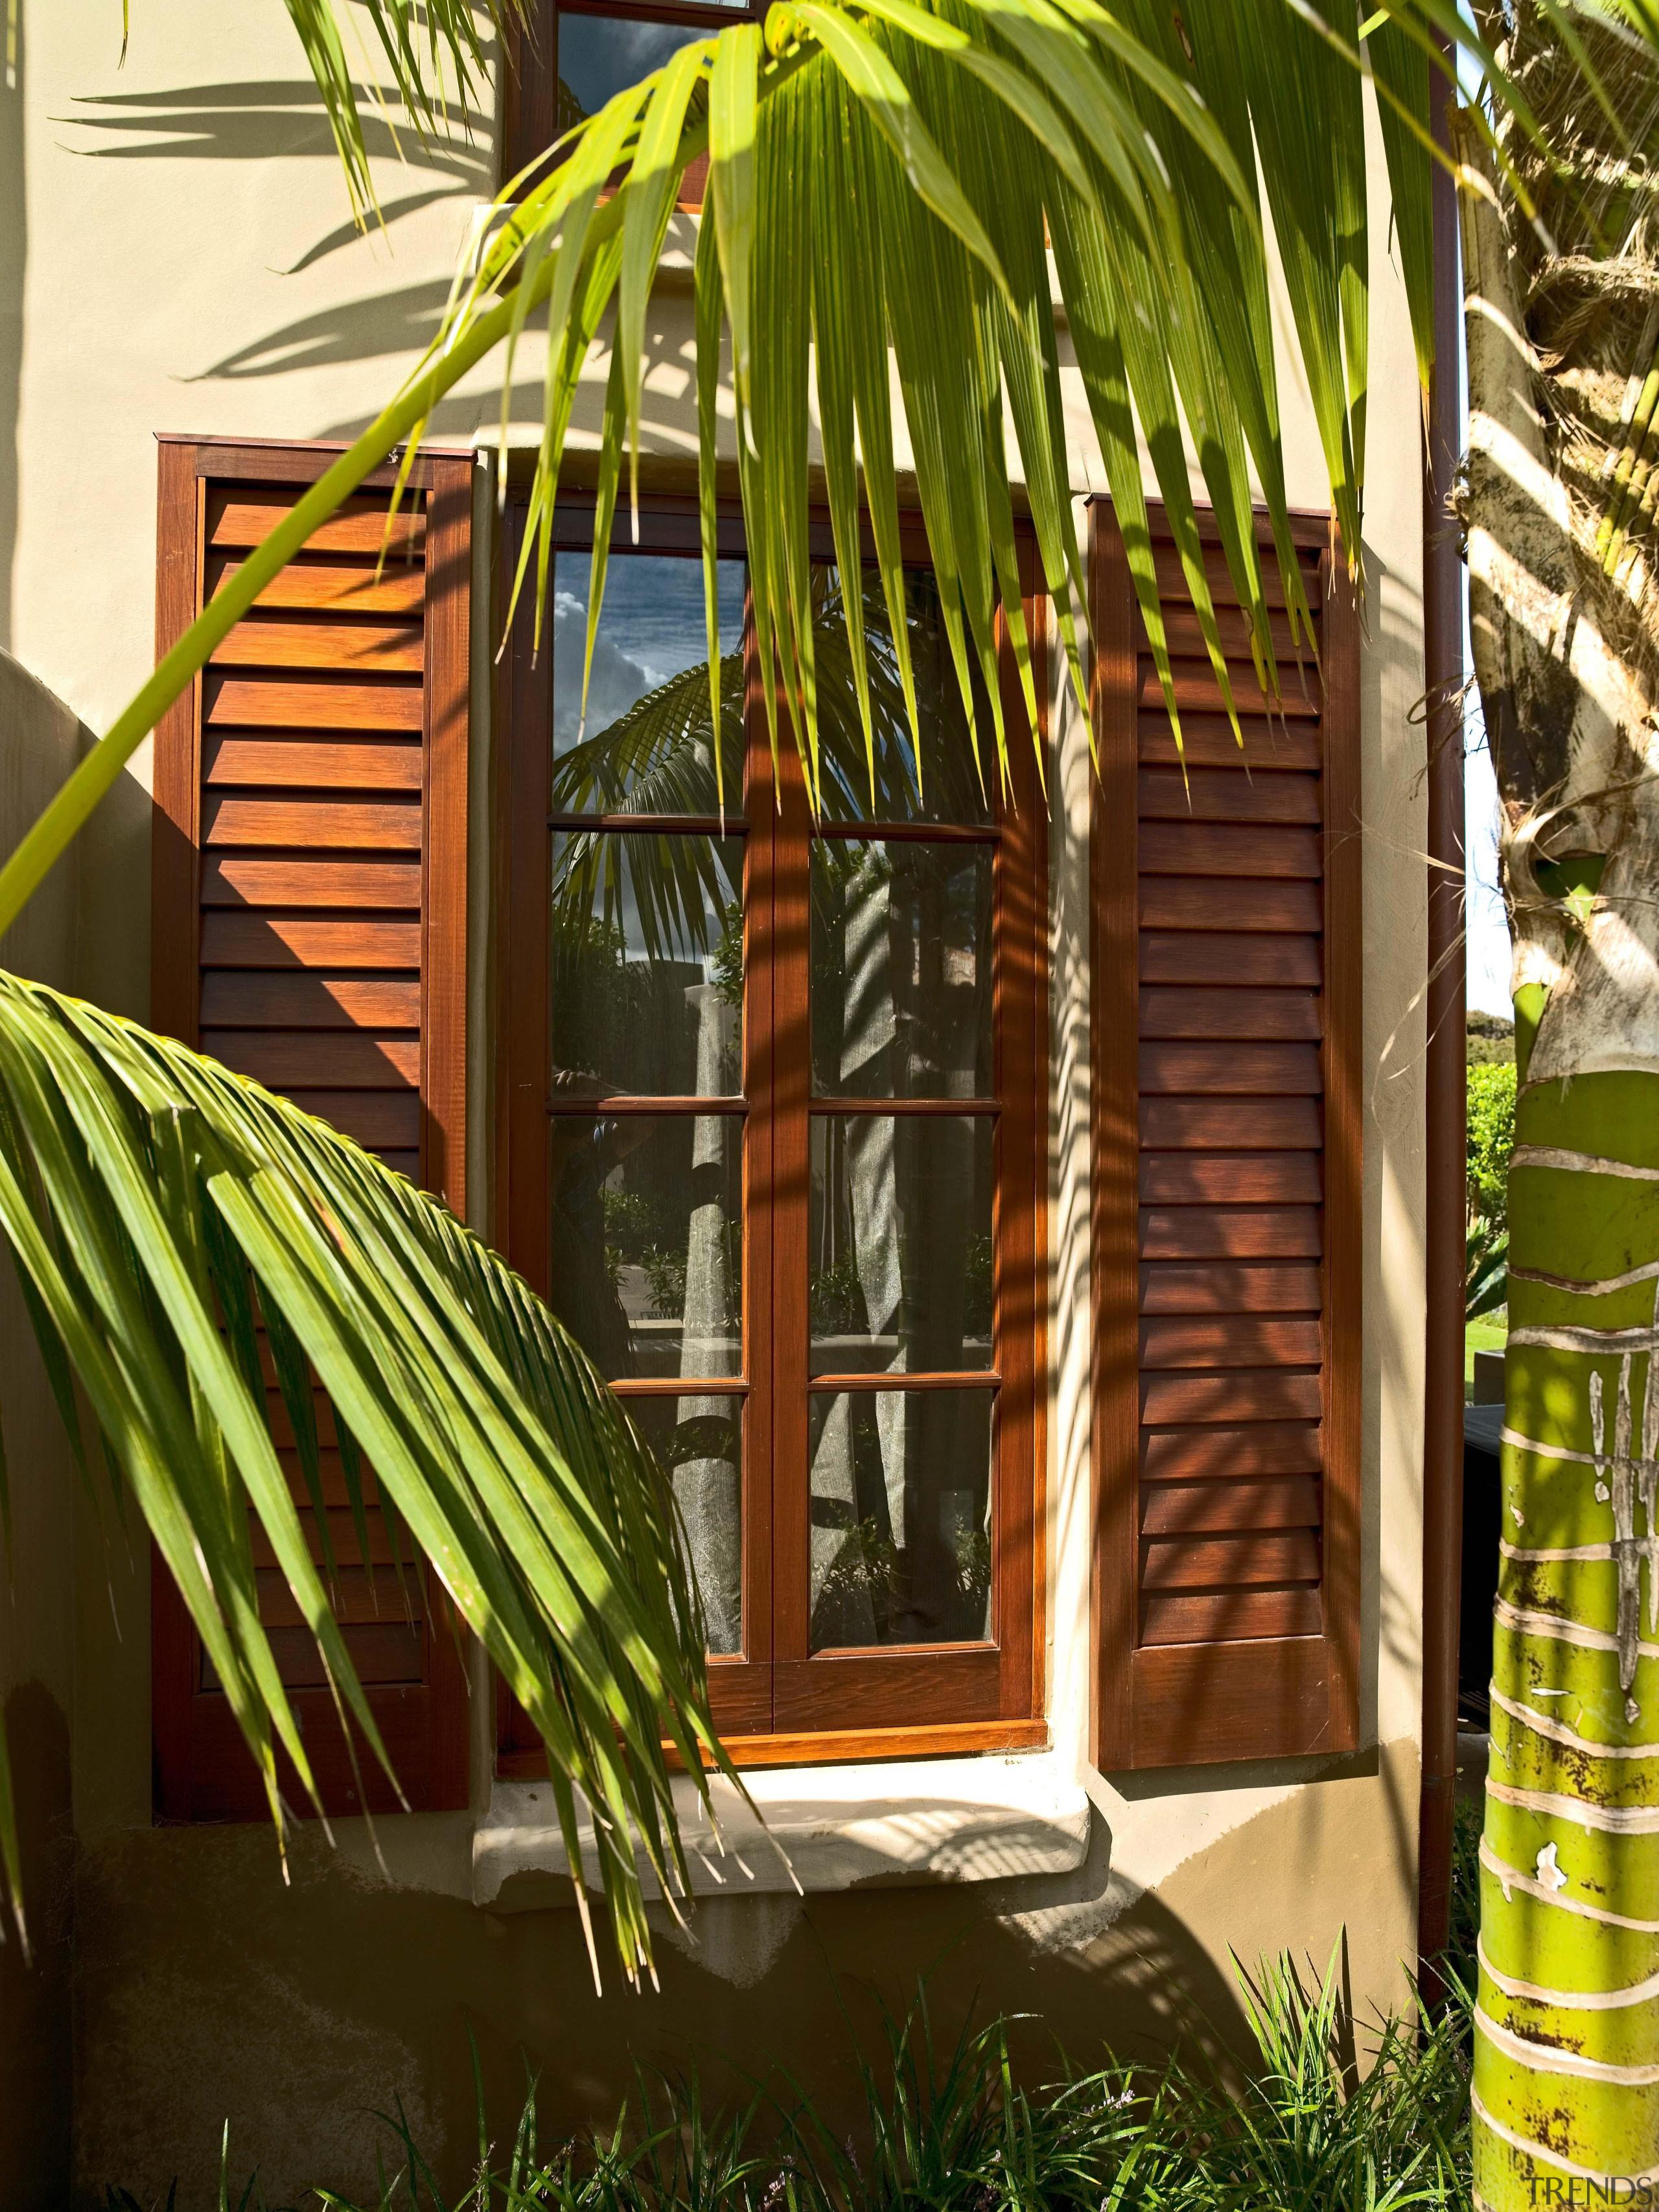 139 Onetaunga 27 - Onetaunga 27 - arecales arecales, house, palm tree, plant, tree, window, brown